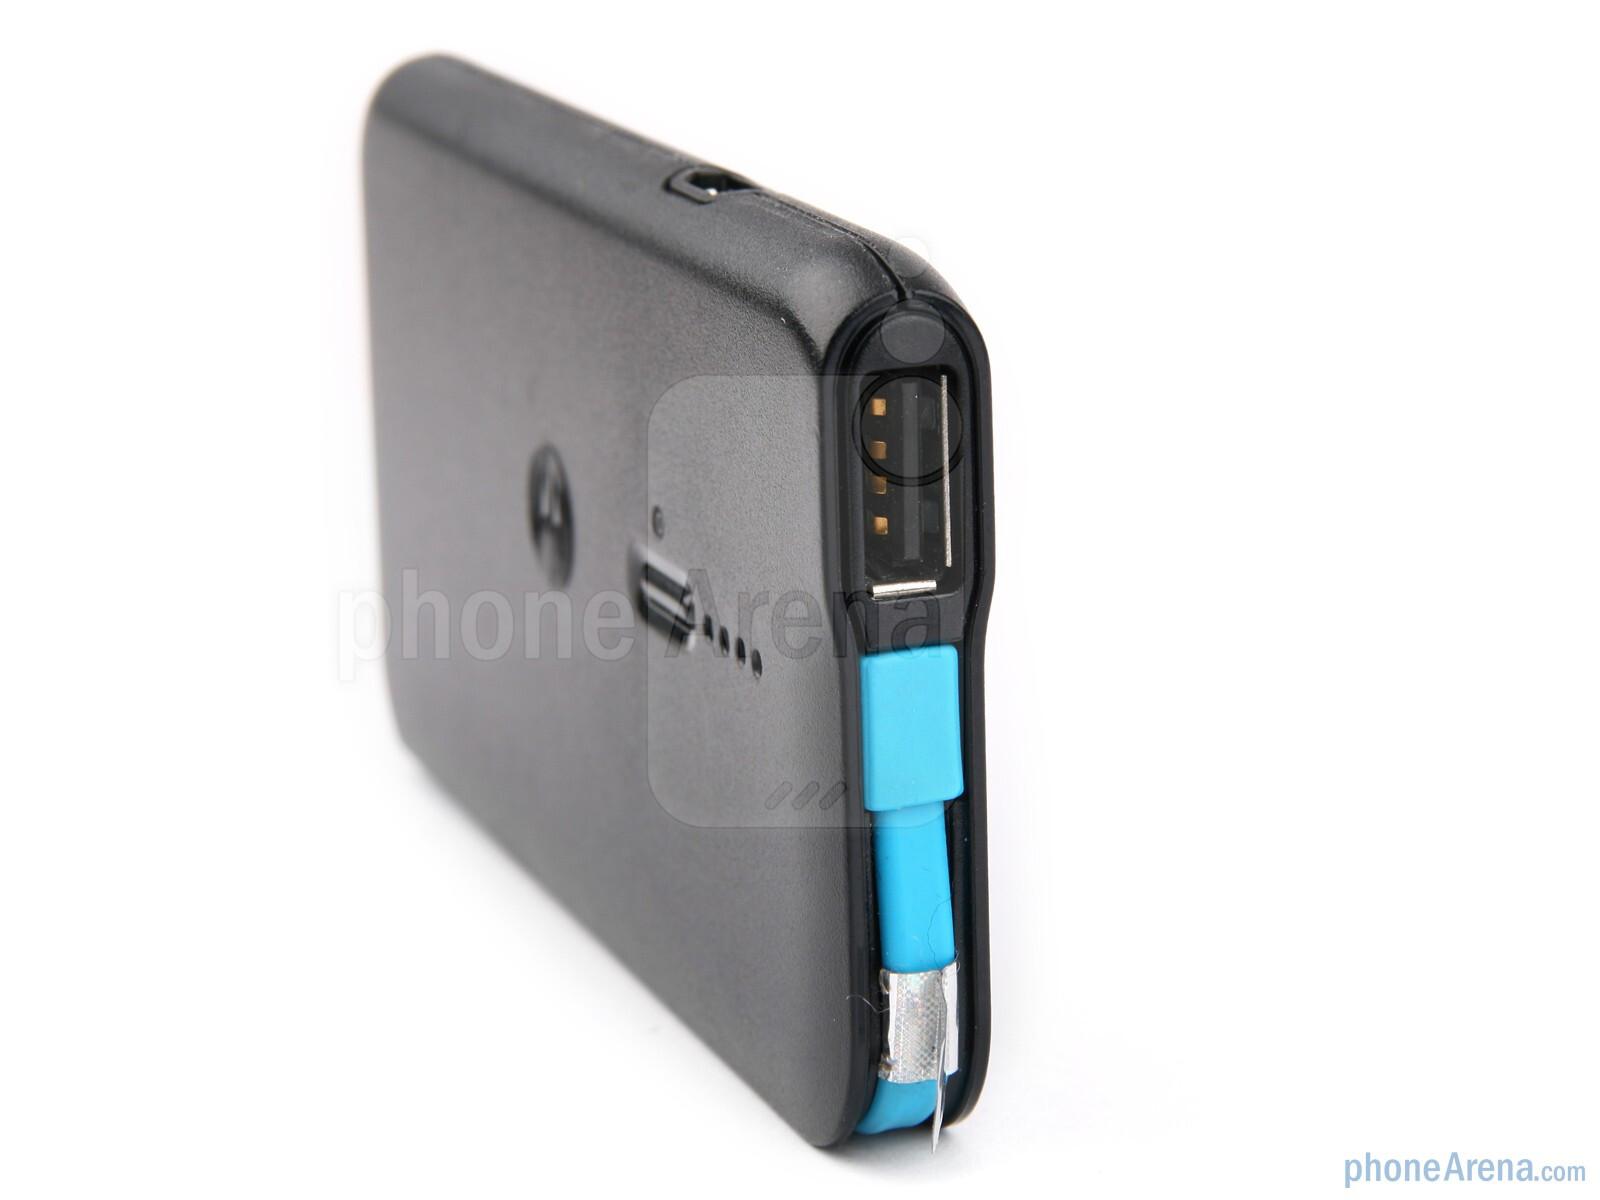 Motorola P793 Universal USB Portable Power Pack Review - PhoneArena 868eacd981e8